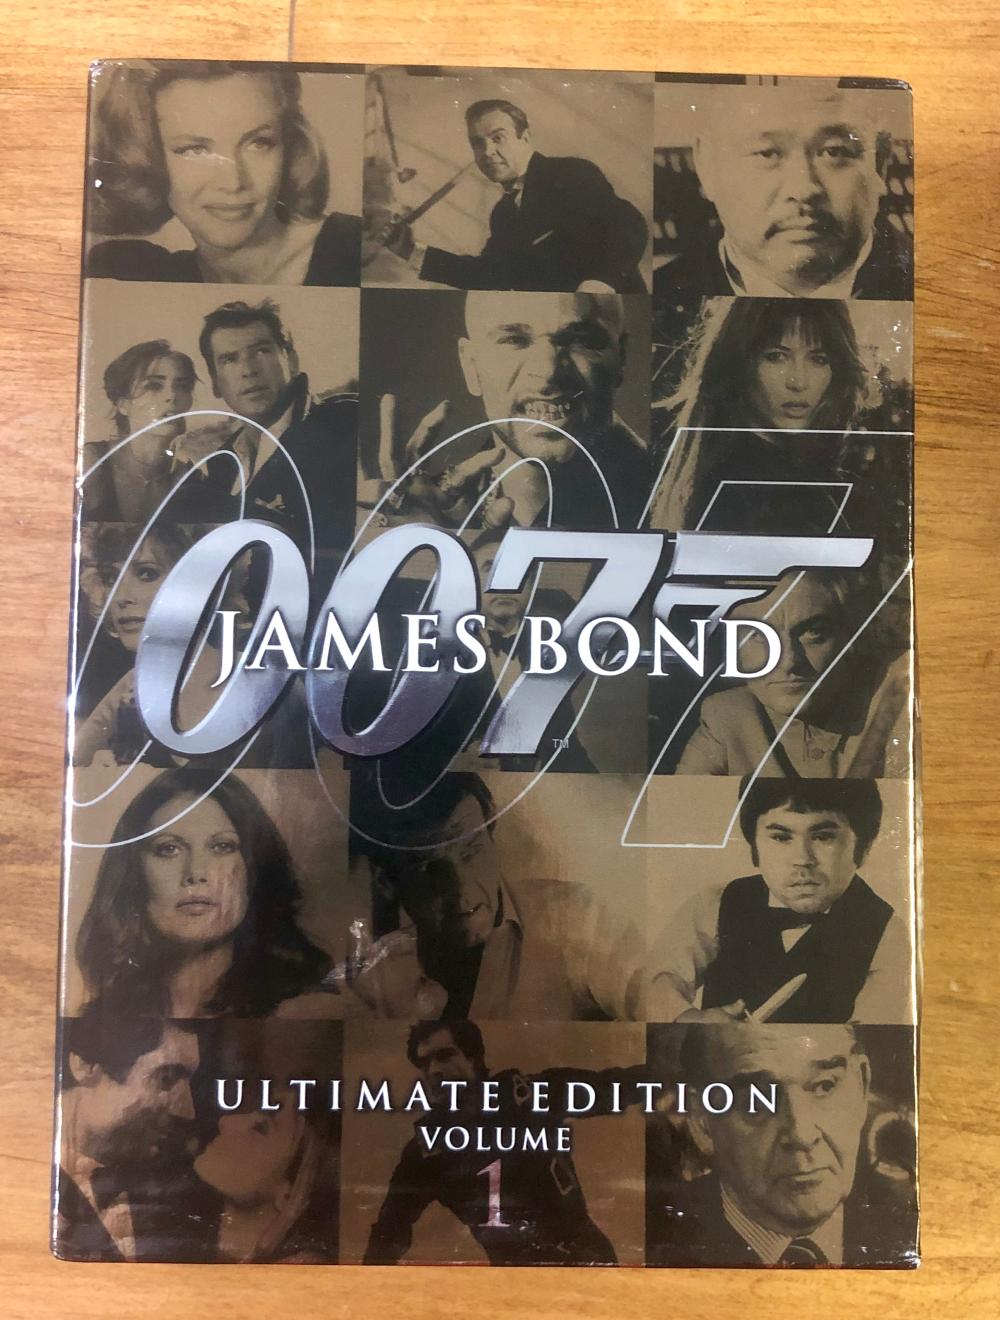 2006 20TH CENTURY FOX 007 JAMES BOND (10) DVD ULTIMATE EDITION SET